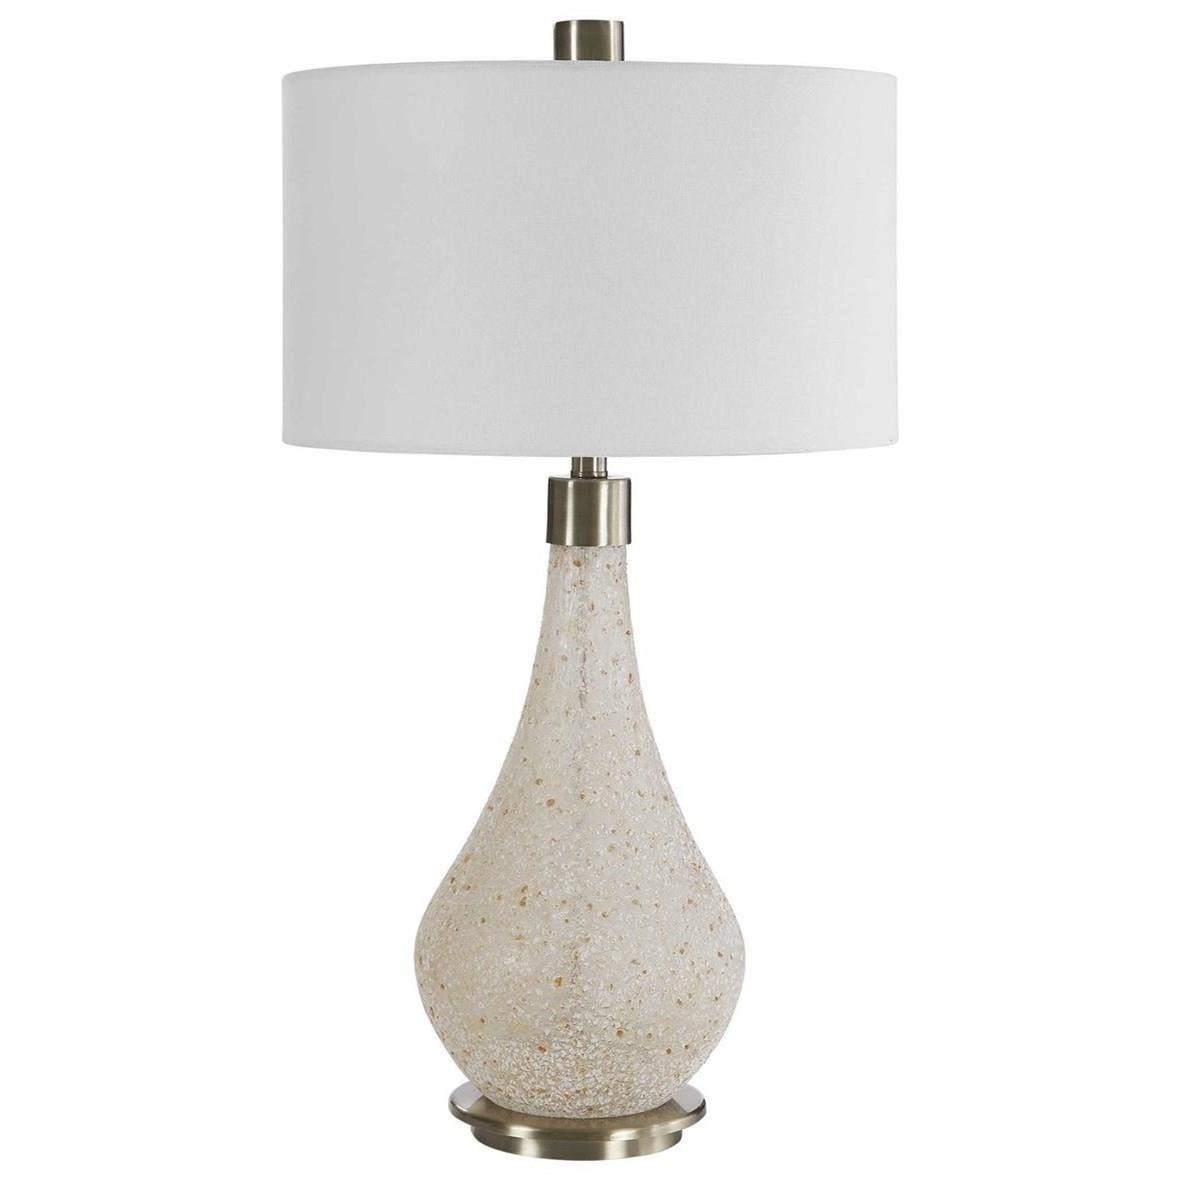 Chaya Textured Cream Table Lamp